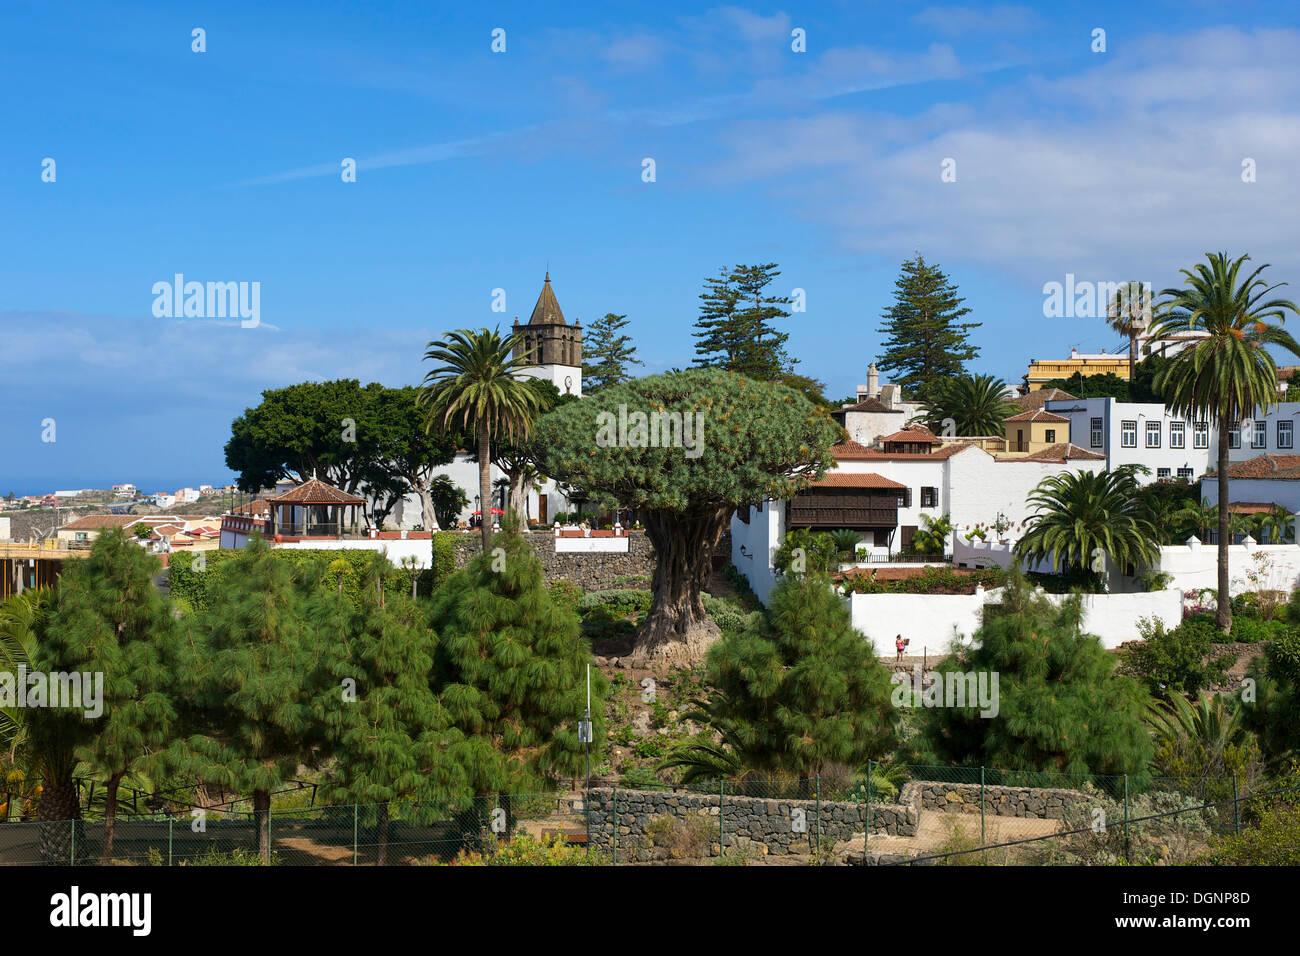 Drago en Icod, Tenerife, Islas Canarias, España, Europa Imagen De Stock